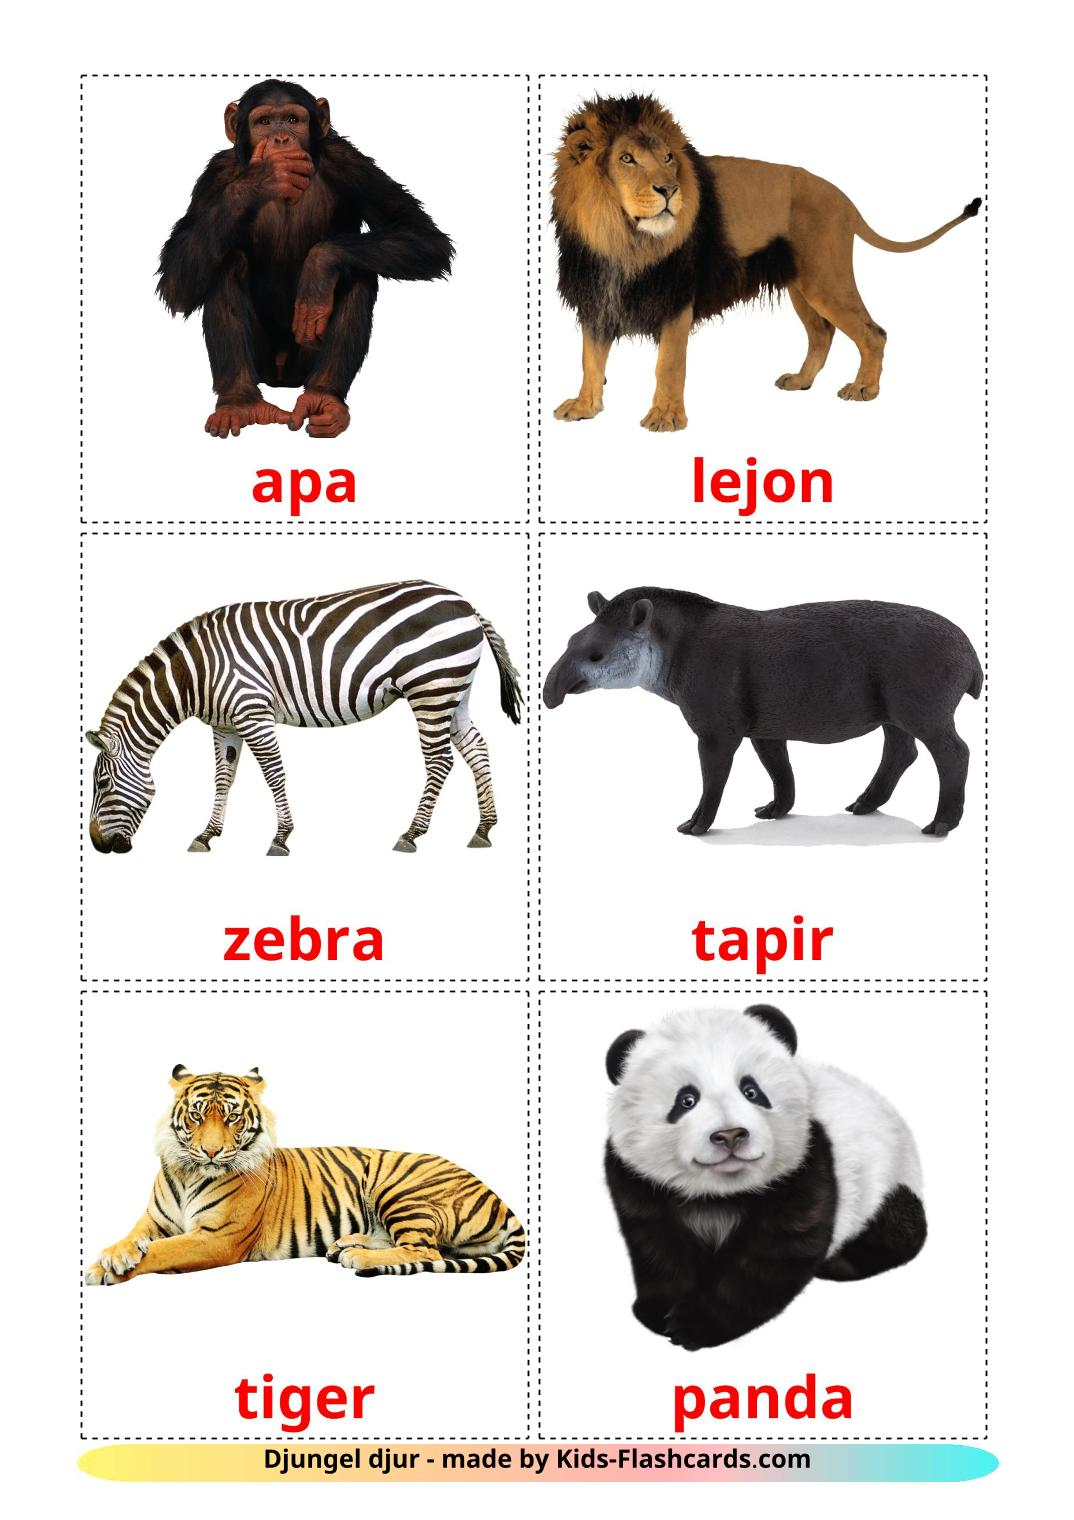 Jungle animals - 21 Free Printable swedish Flashcards